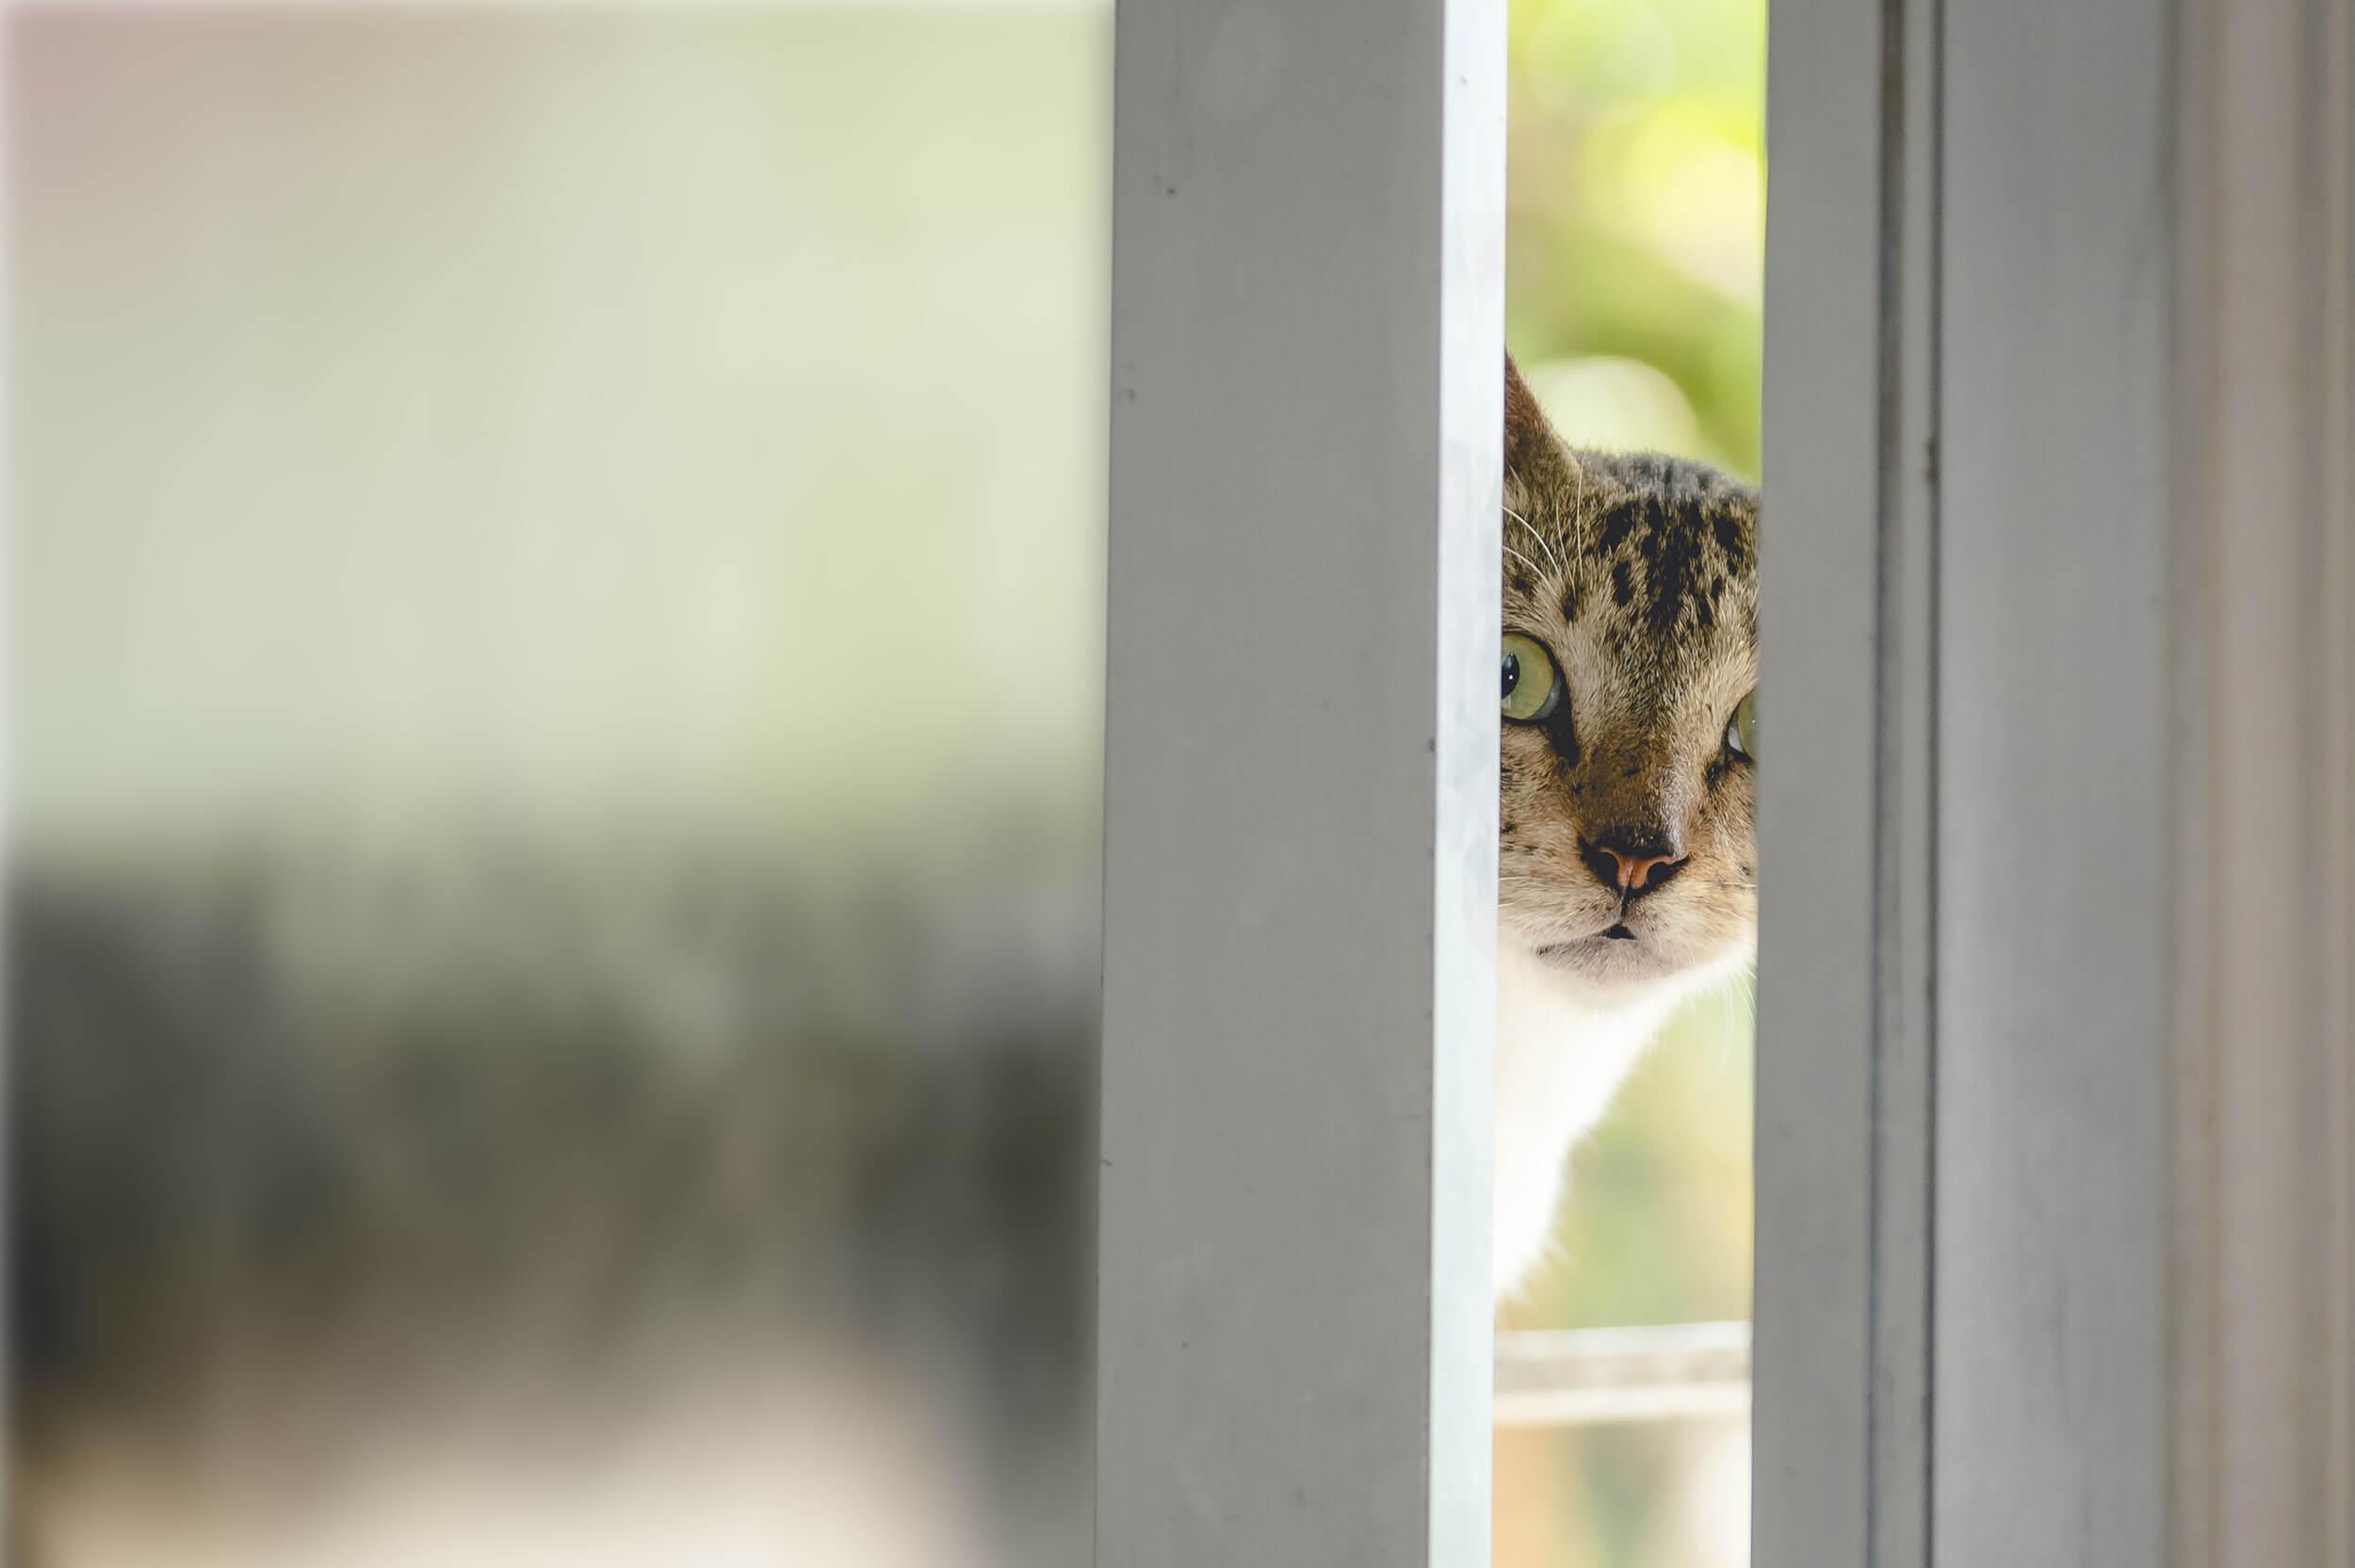 A cat peering through a slightly open window